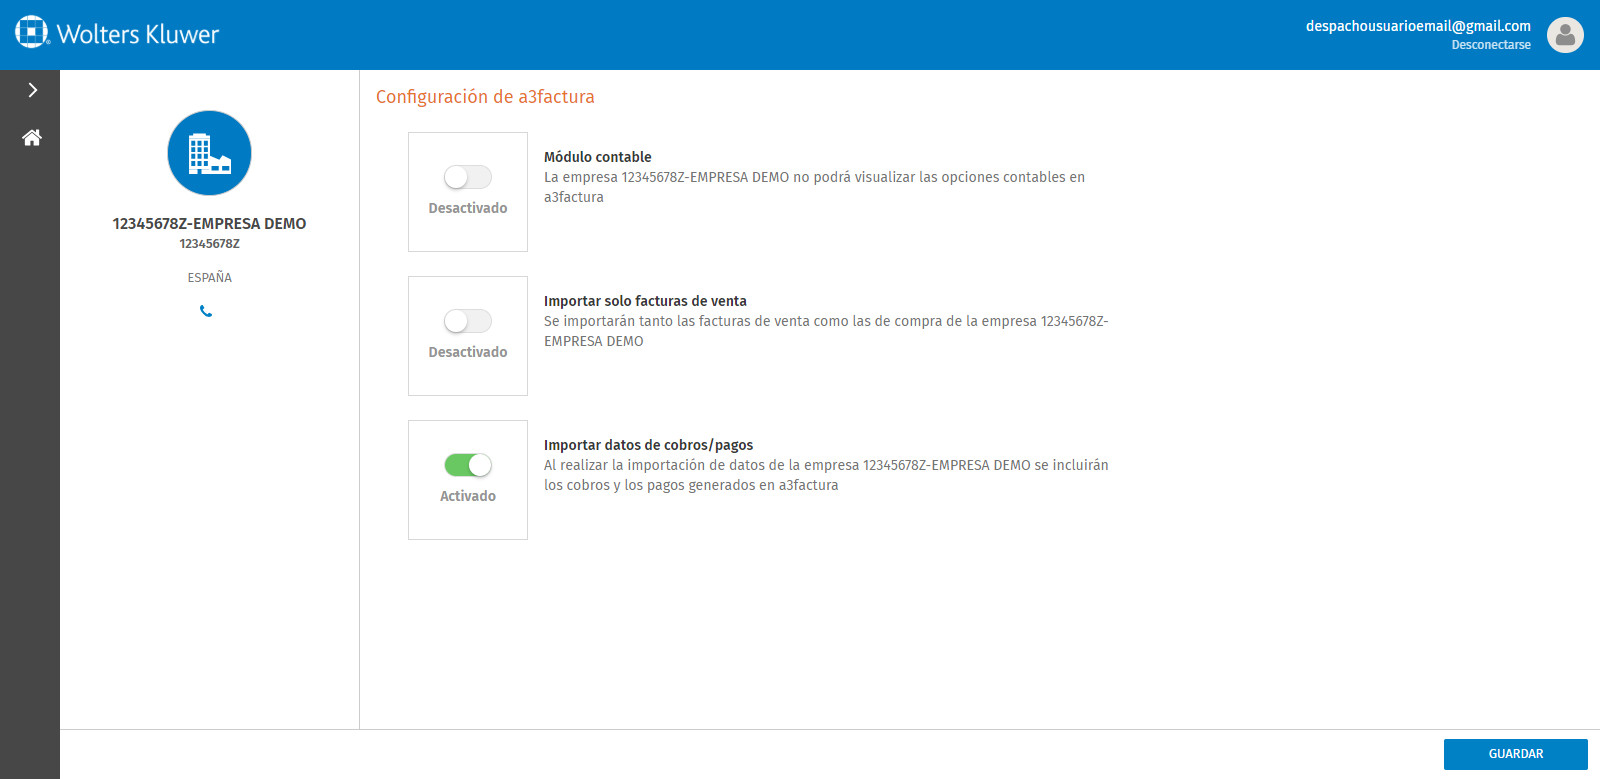 Portal a3factura Configuracion de a3factura opciones